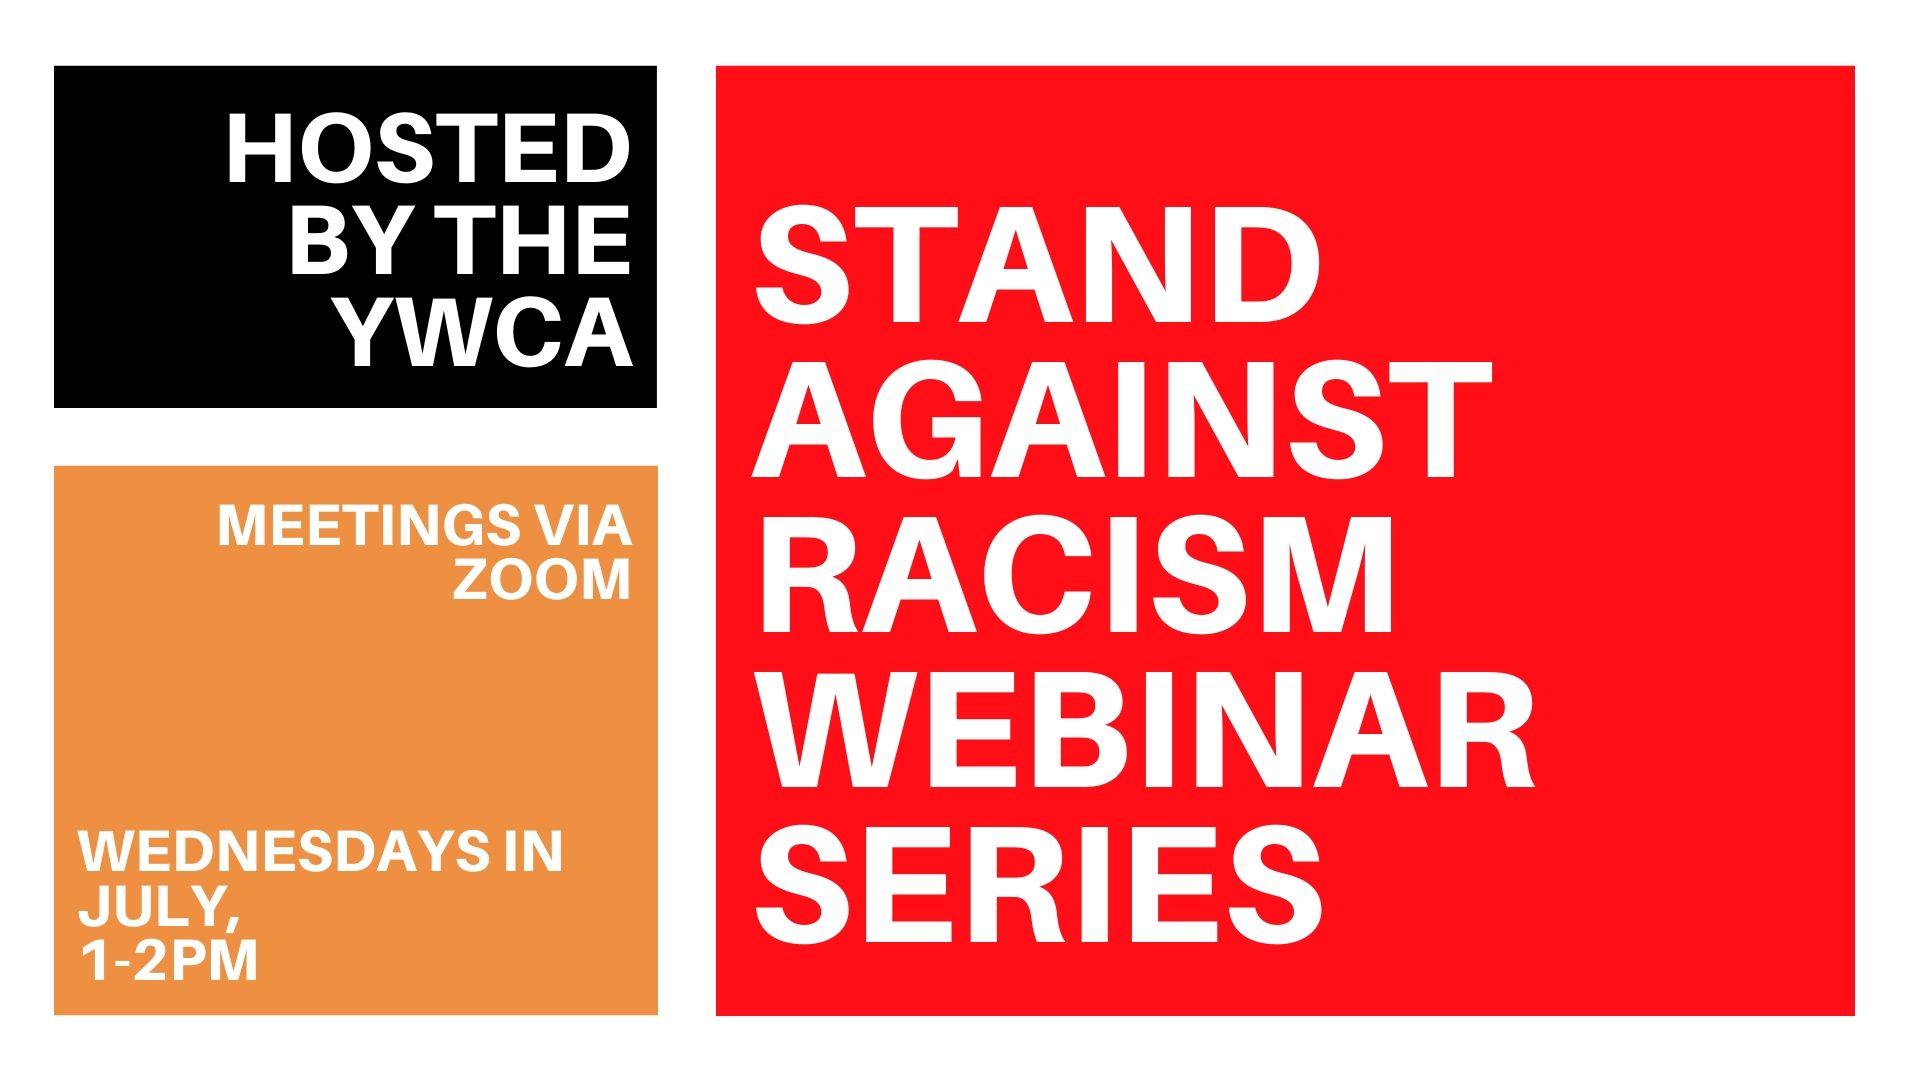 Stand Against Racism Webinar Series